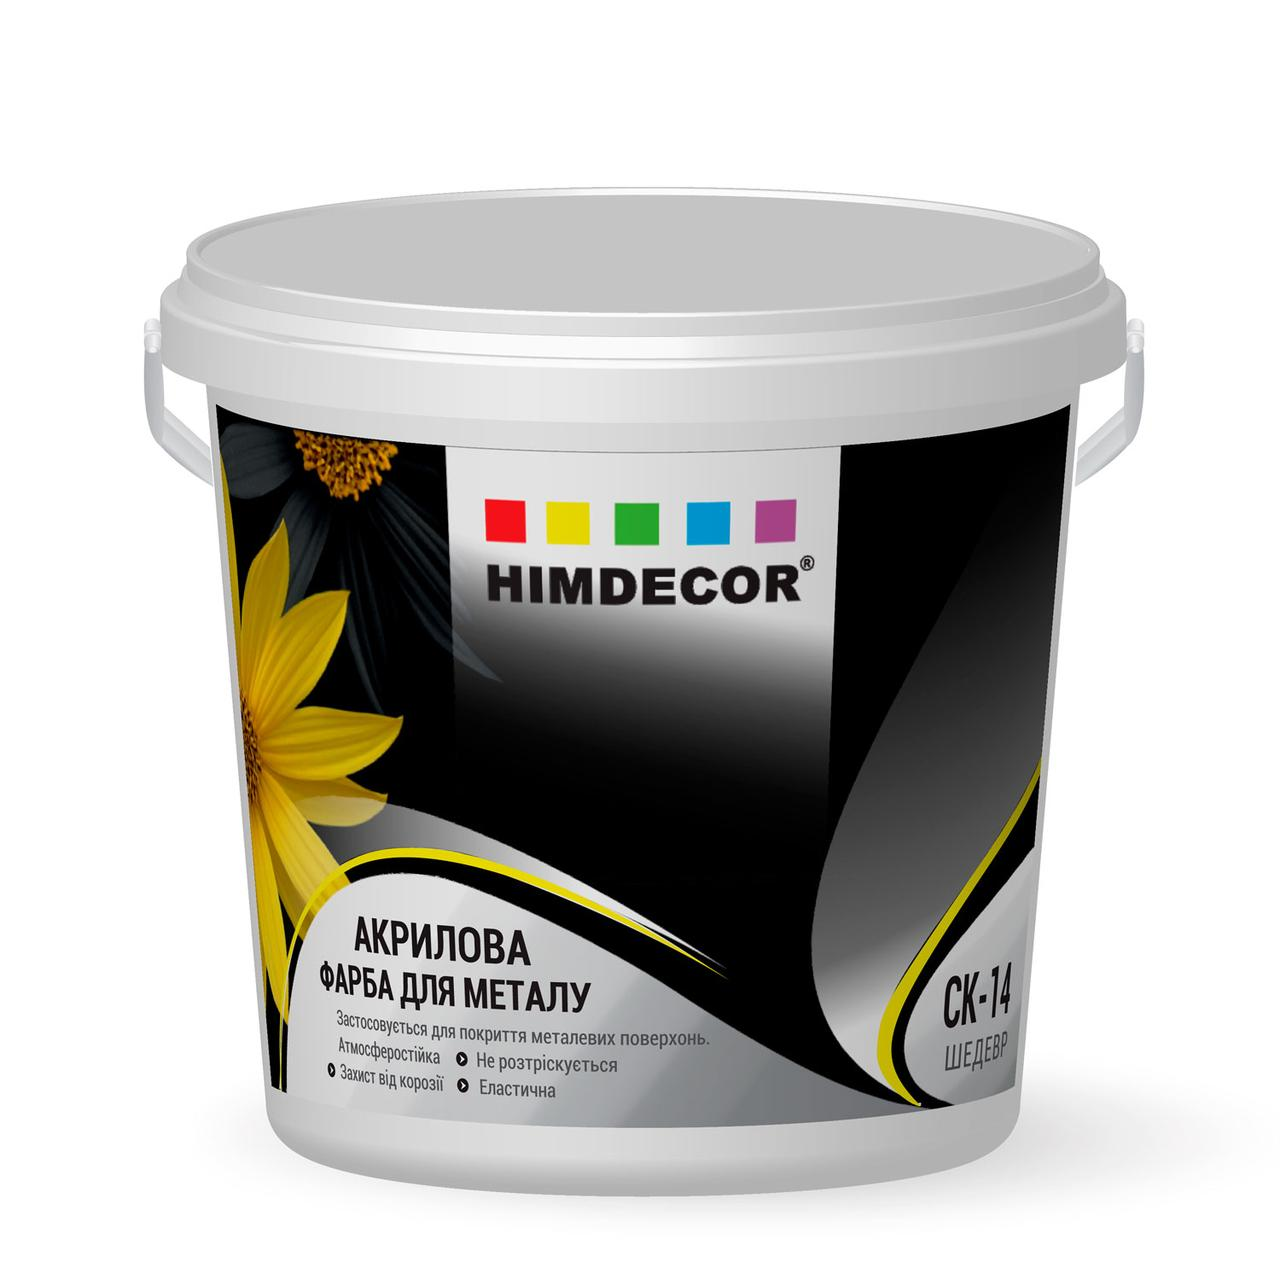 Акрилова фарба по металу Himdecor Shedevr СК-14 800гр. ПРОЗОРА БАЗА